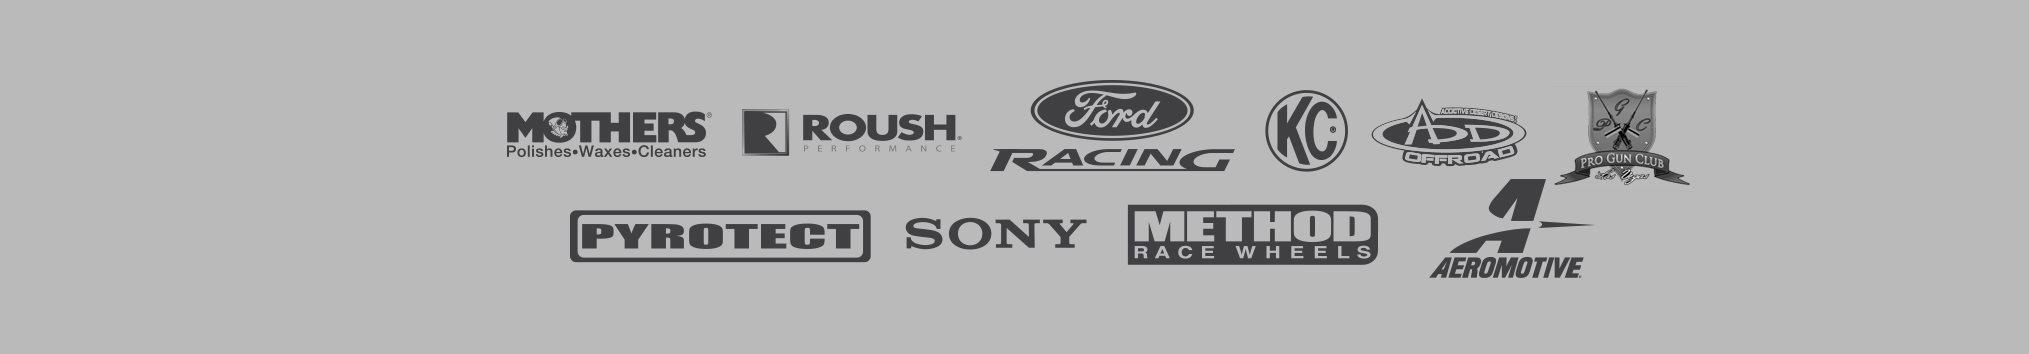 Logos-Final-2.jpg